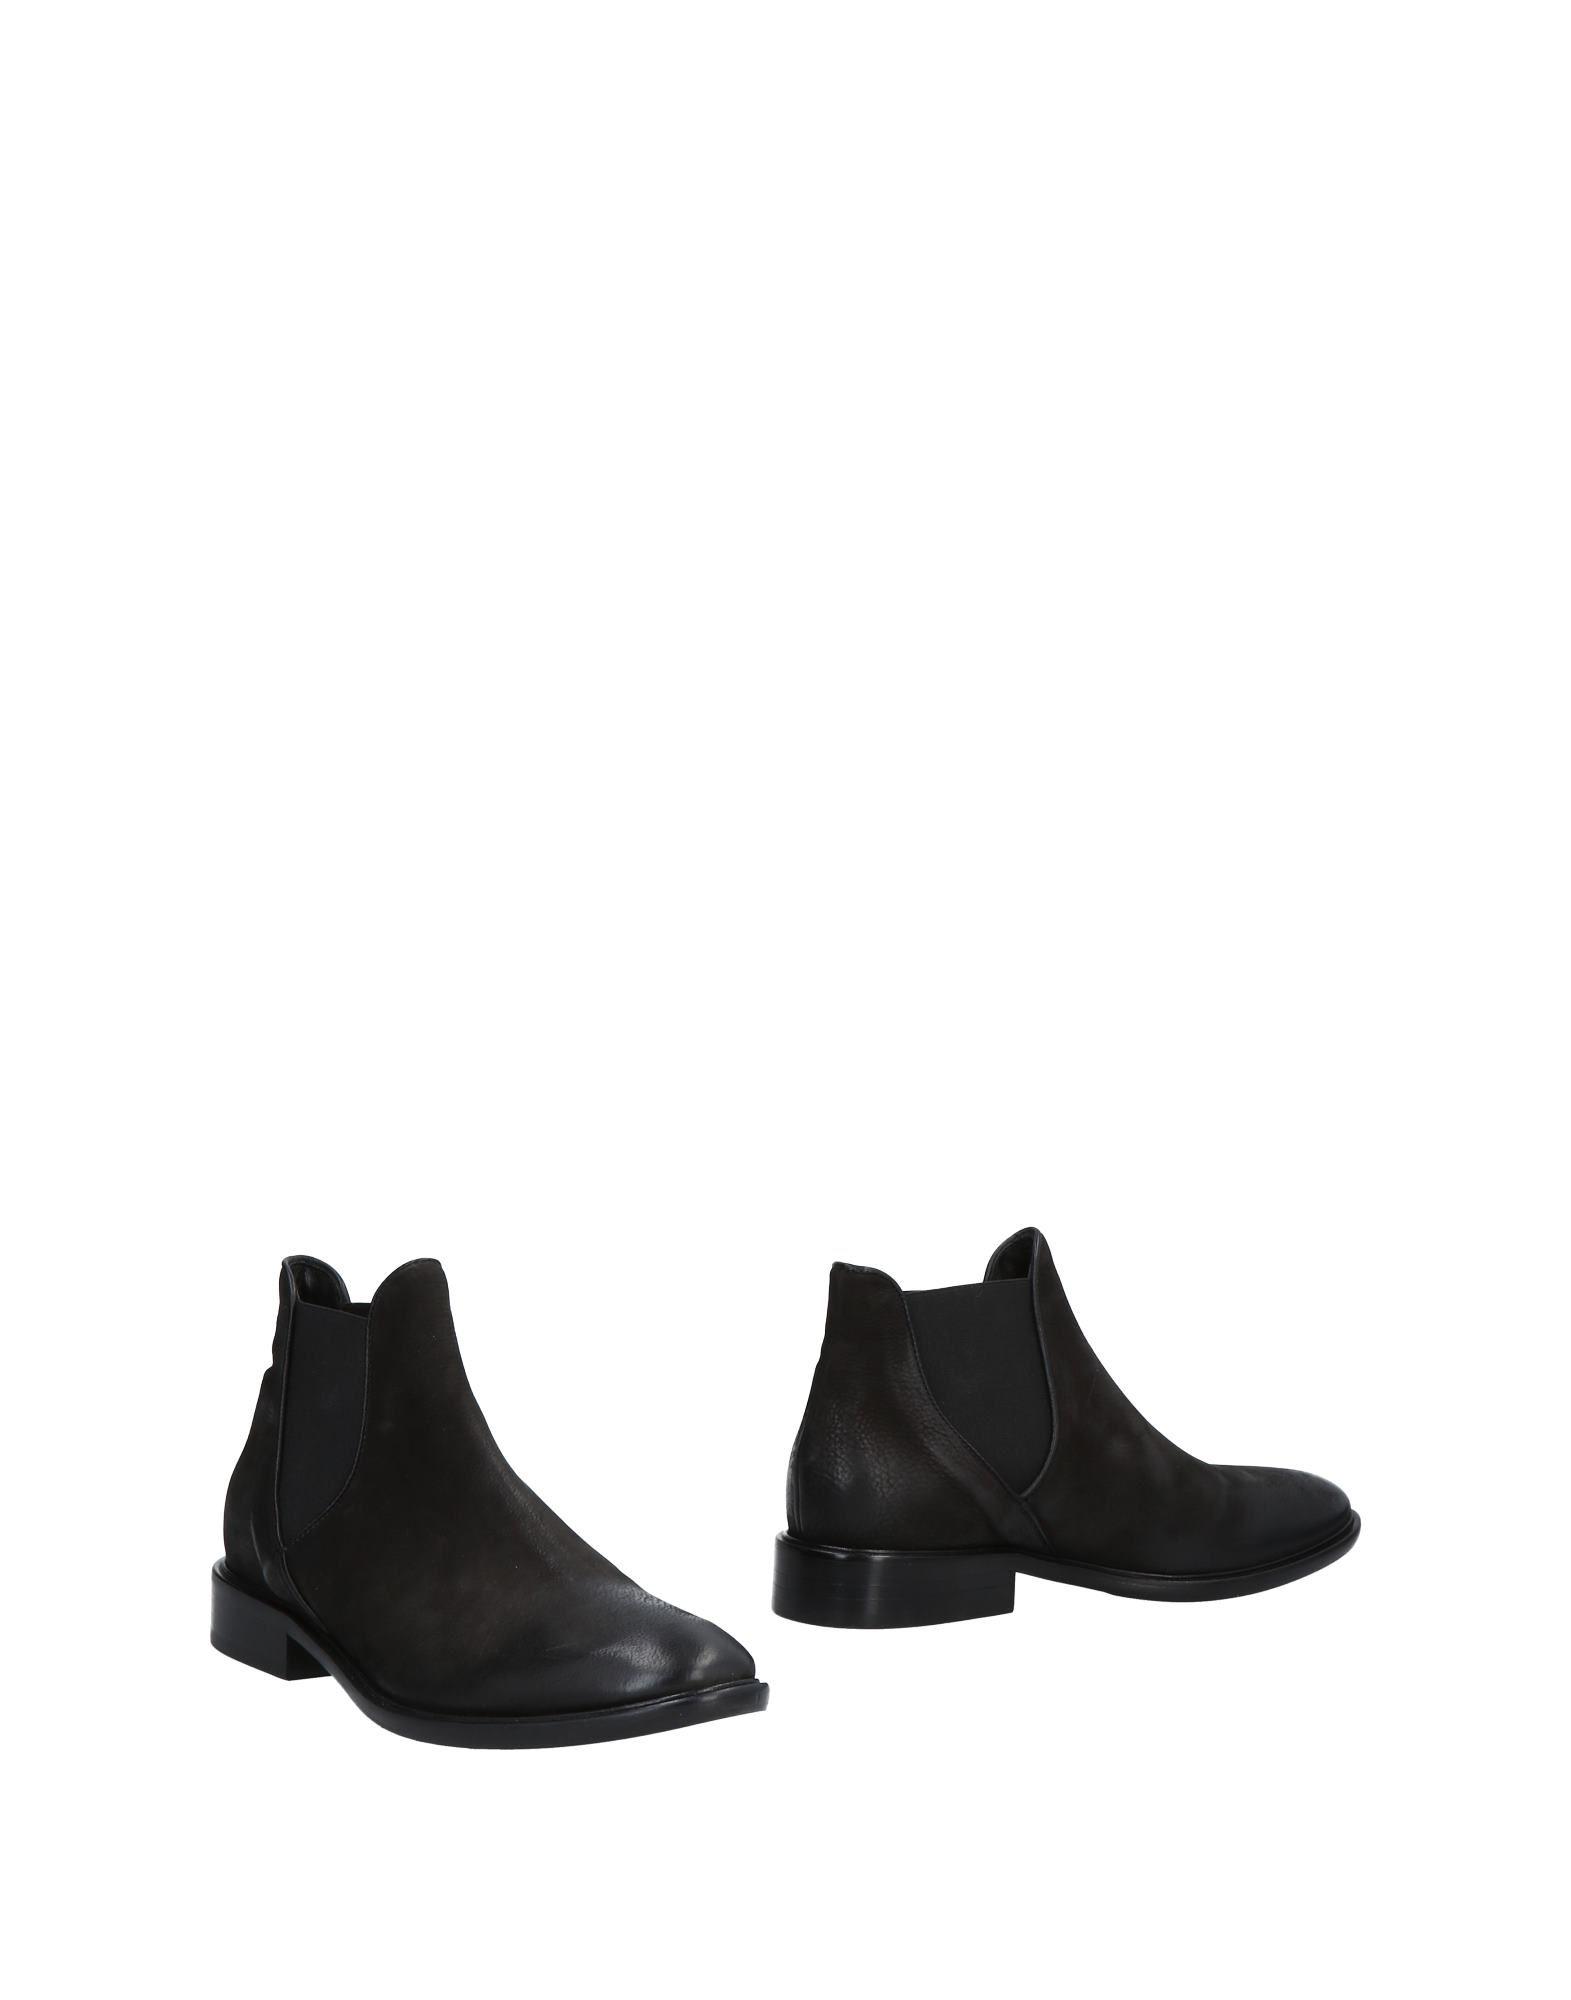 Stilvolle billige Schuhe Bruschi 11486621WE Chelsea Stiefel Damen  11486621WE Bruschi 08e98e